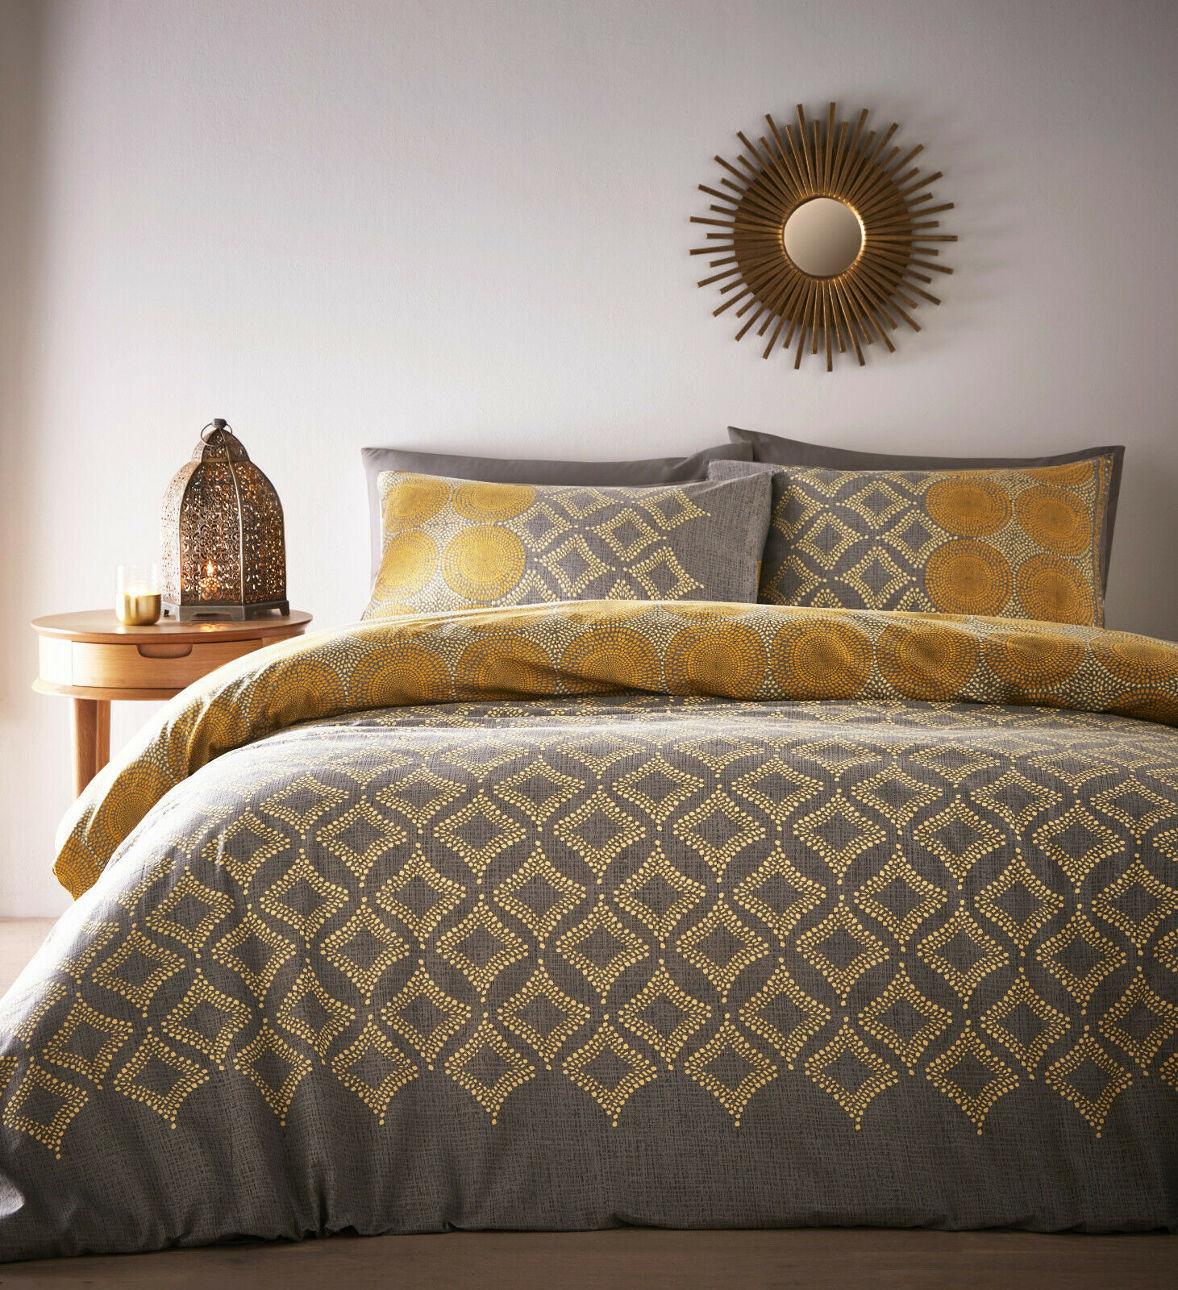 Bedding Grace Fleece Teddy Bear Quilt Duvet Cover Pillowcase Warm Cozy Thermal Winter Home Furniture Diy Coccinelli De